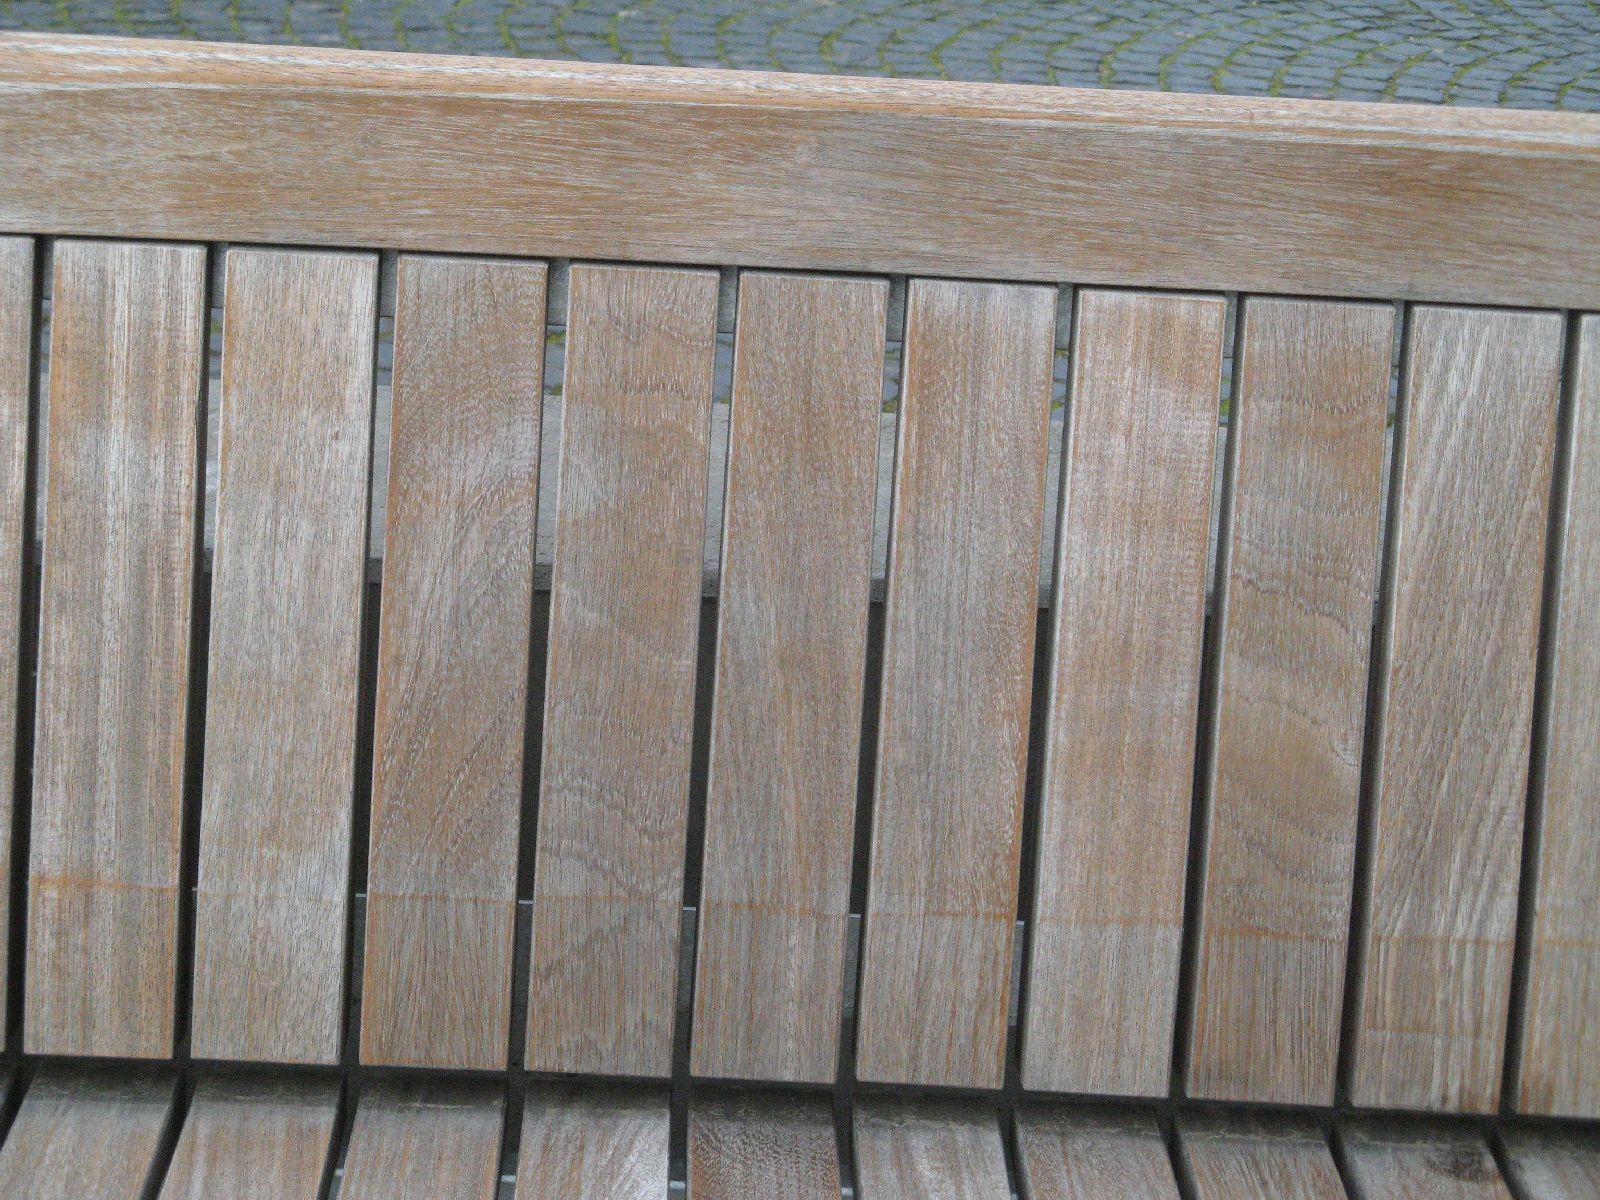 Wood_Textures_B_3123